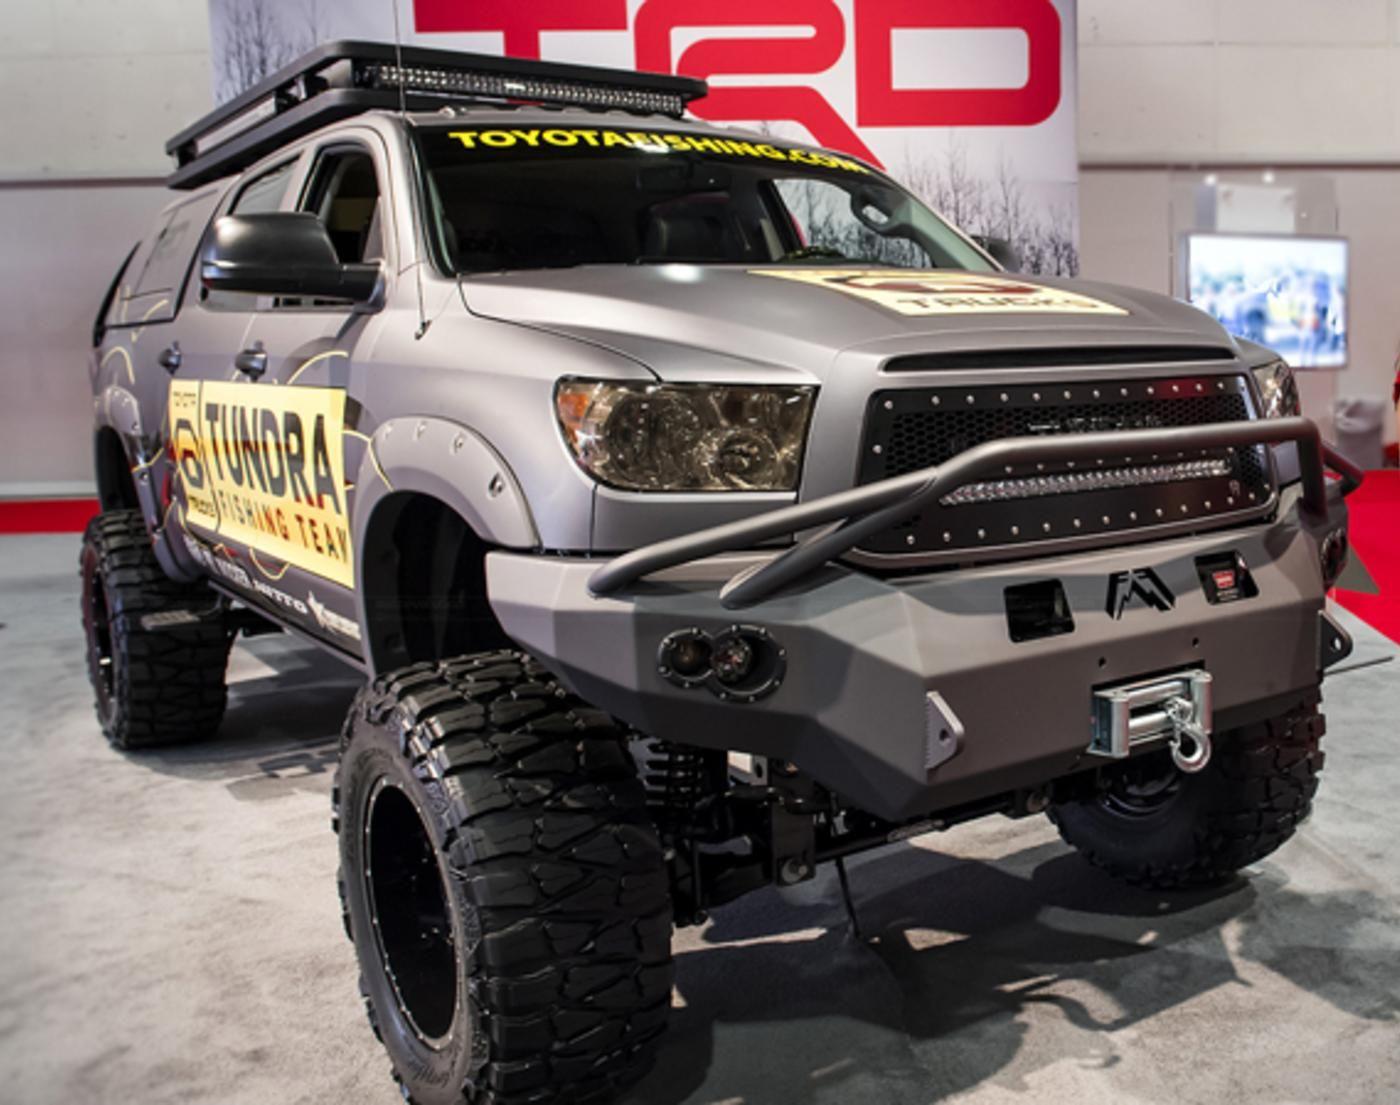 Toyota tundra ultimate fishing edition by britt myers cs motorsports